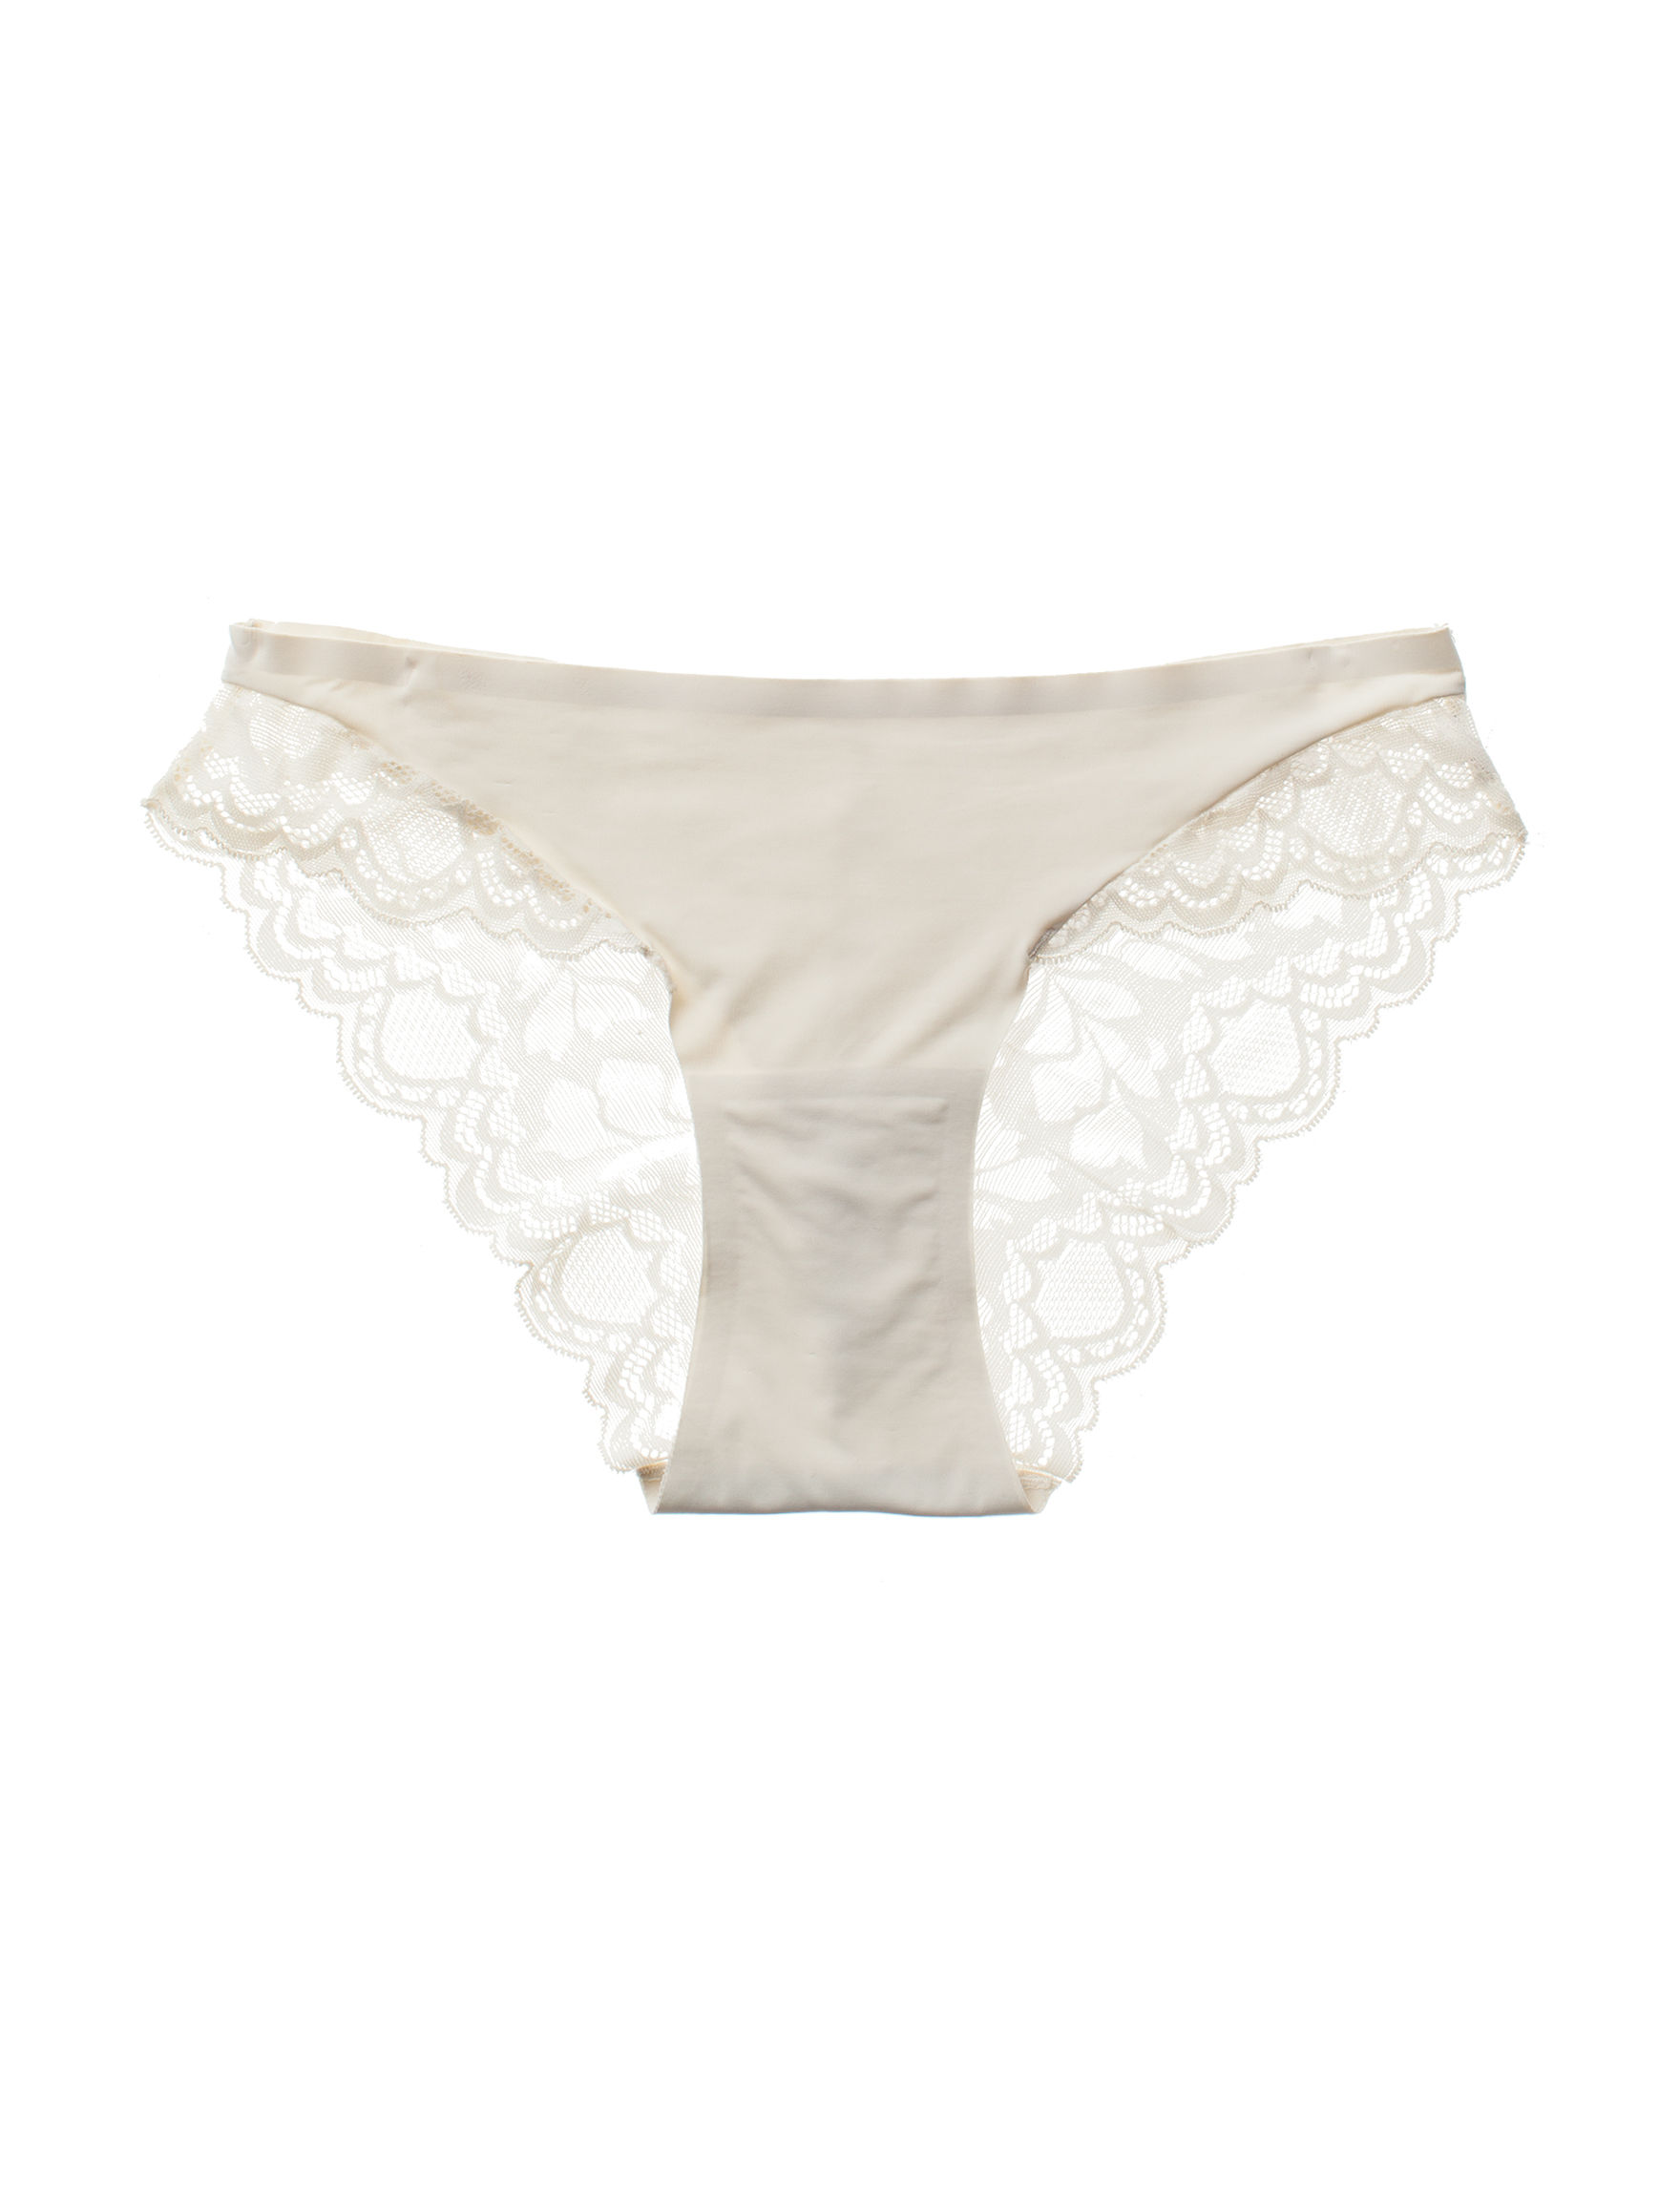 Sophie B Grey Panties Bikini